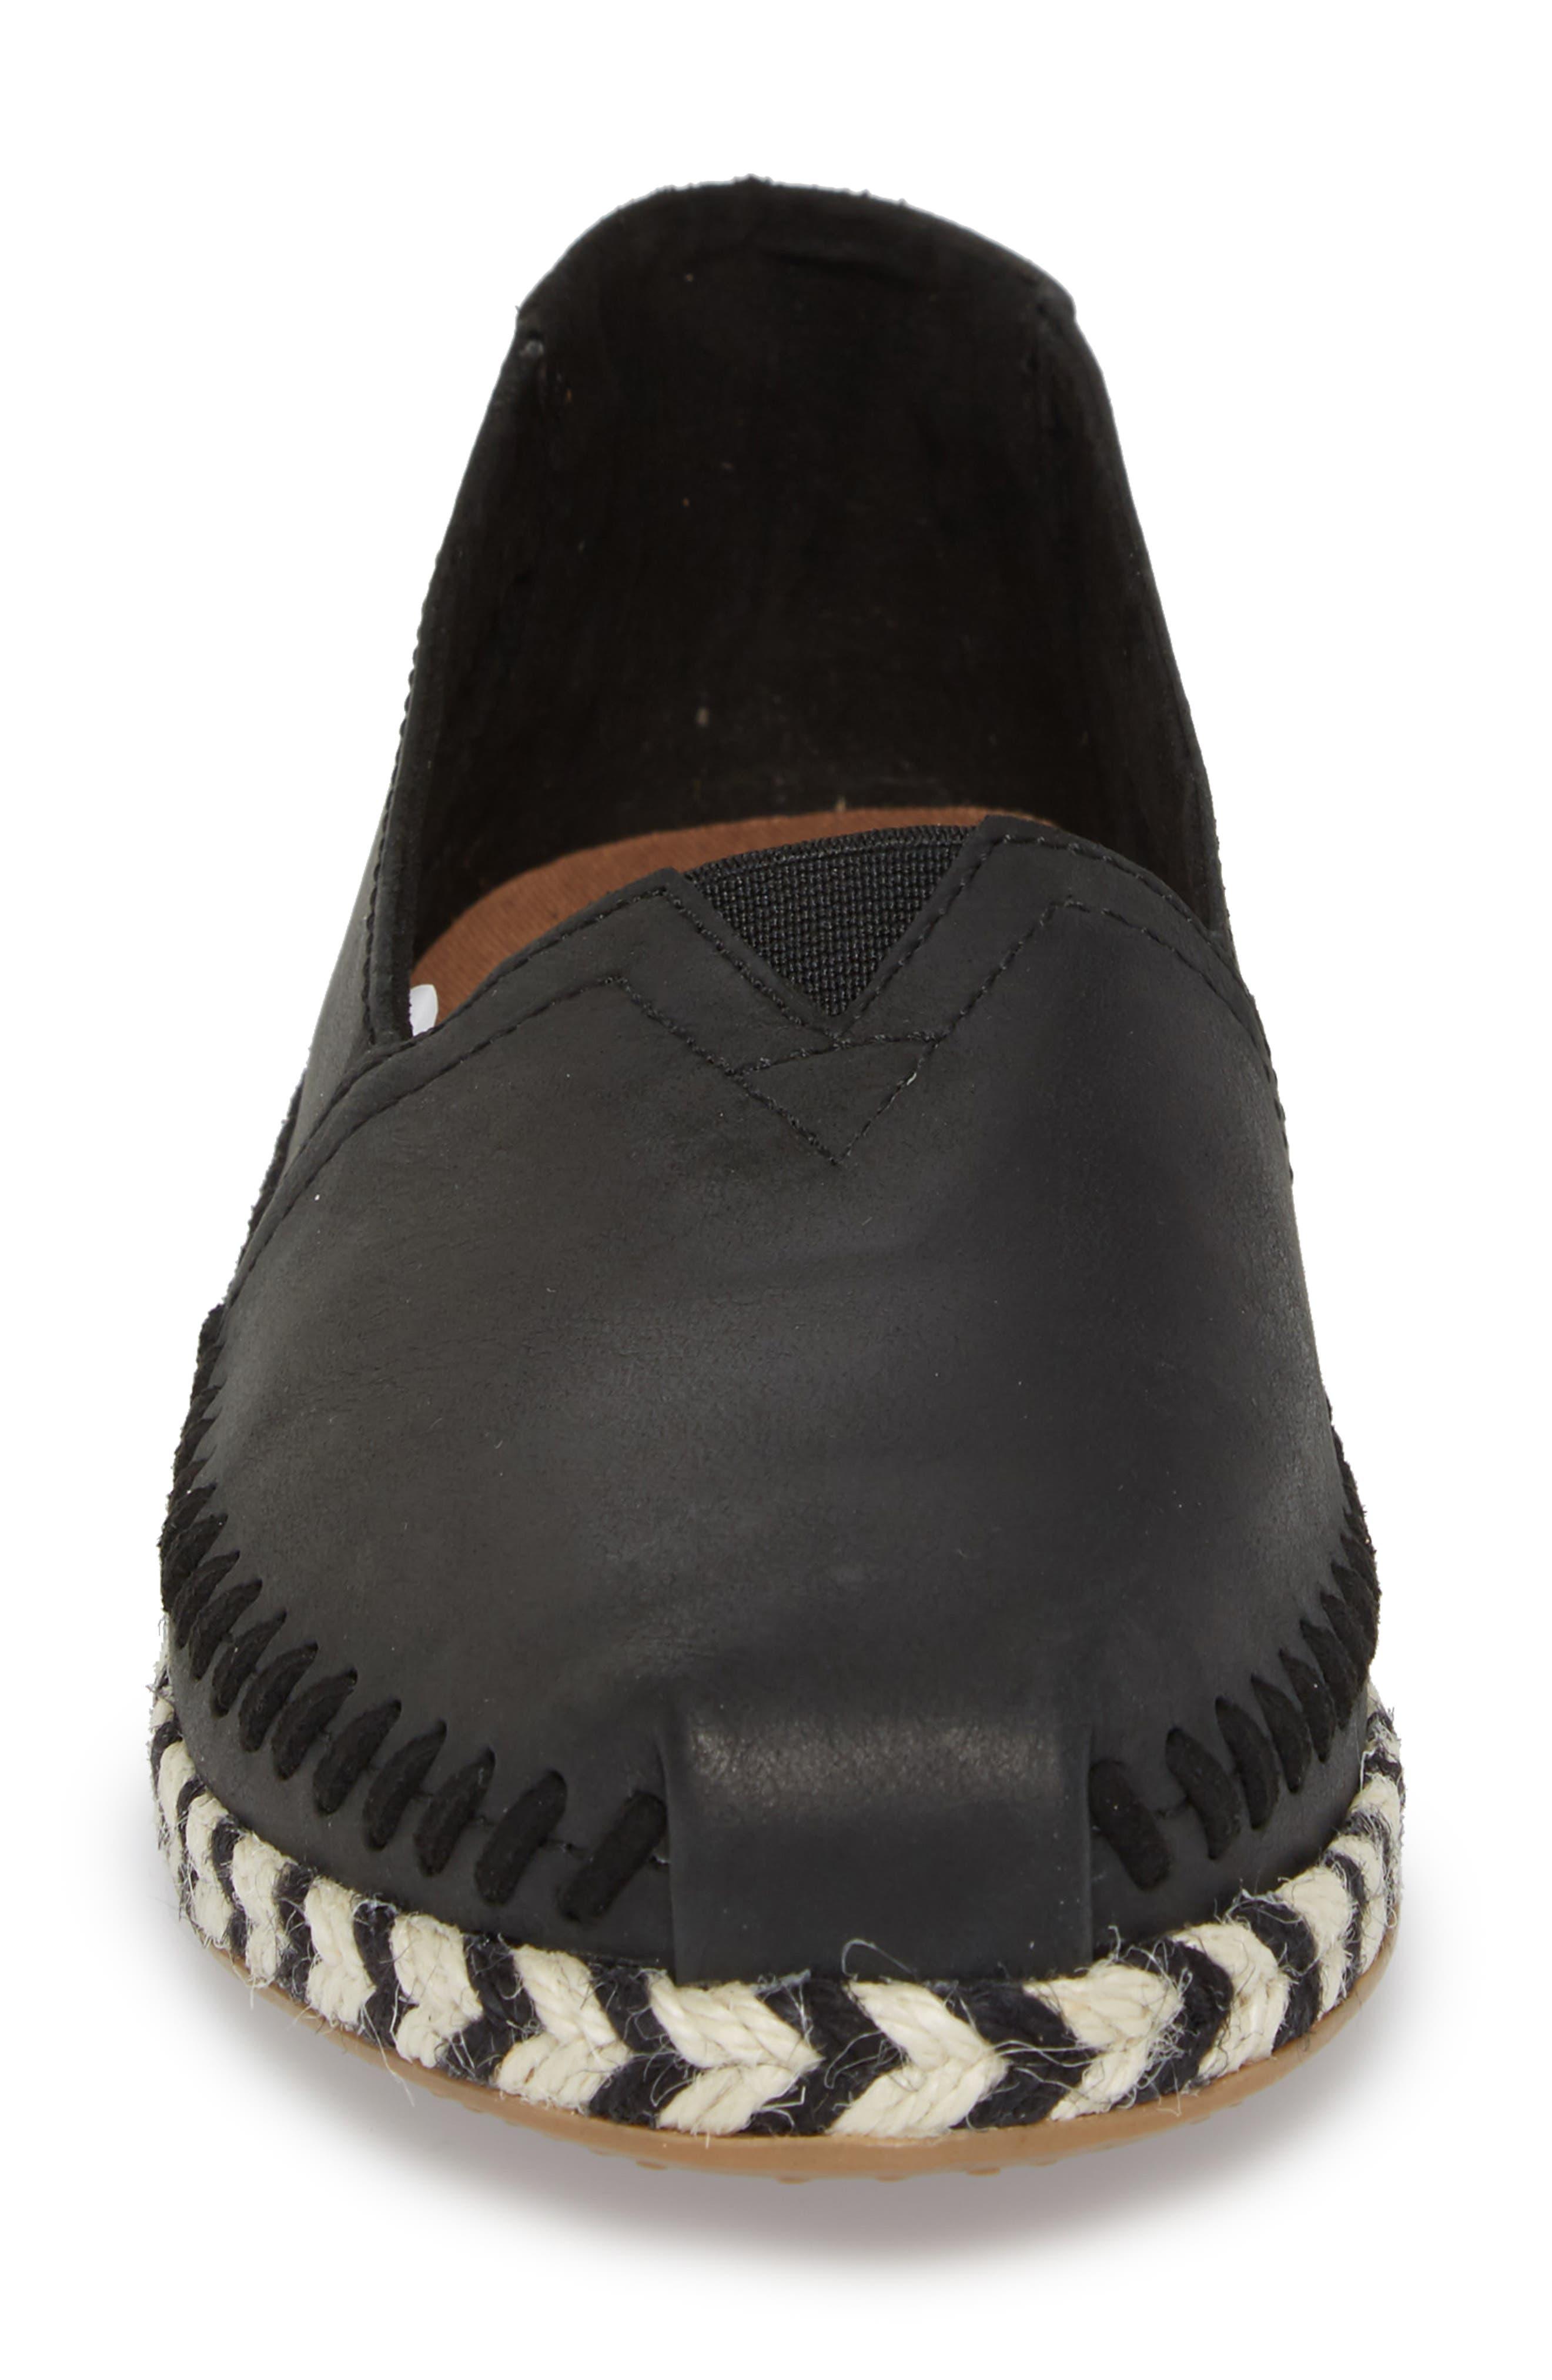 Alpargata Slip-On,                             Alternate thumbnail 4, color,                             Black Leather Rope Sole